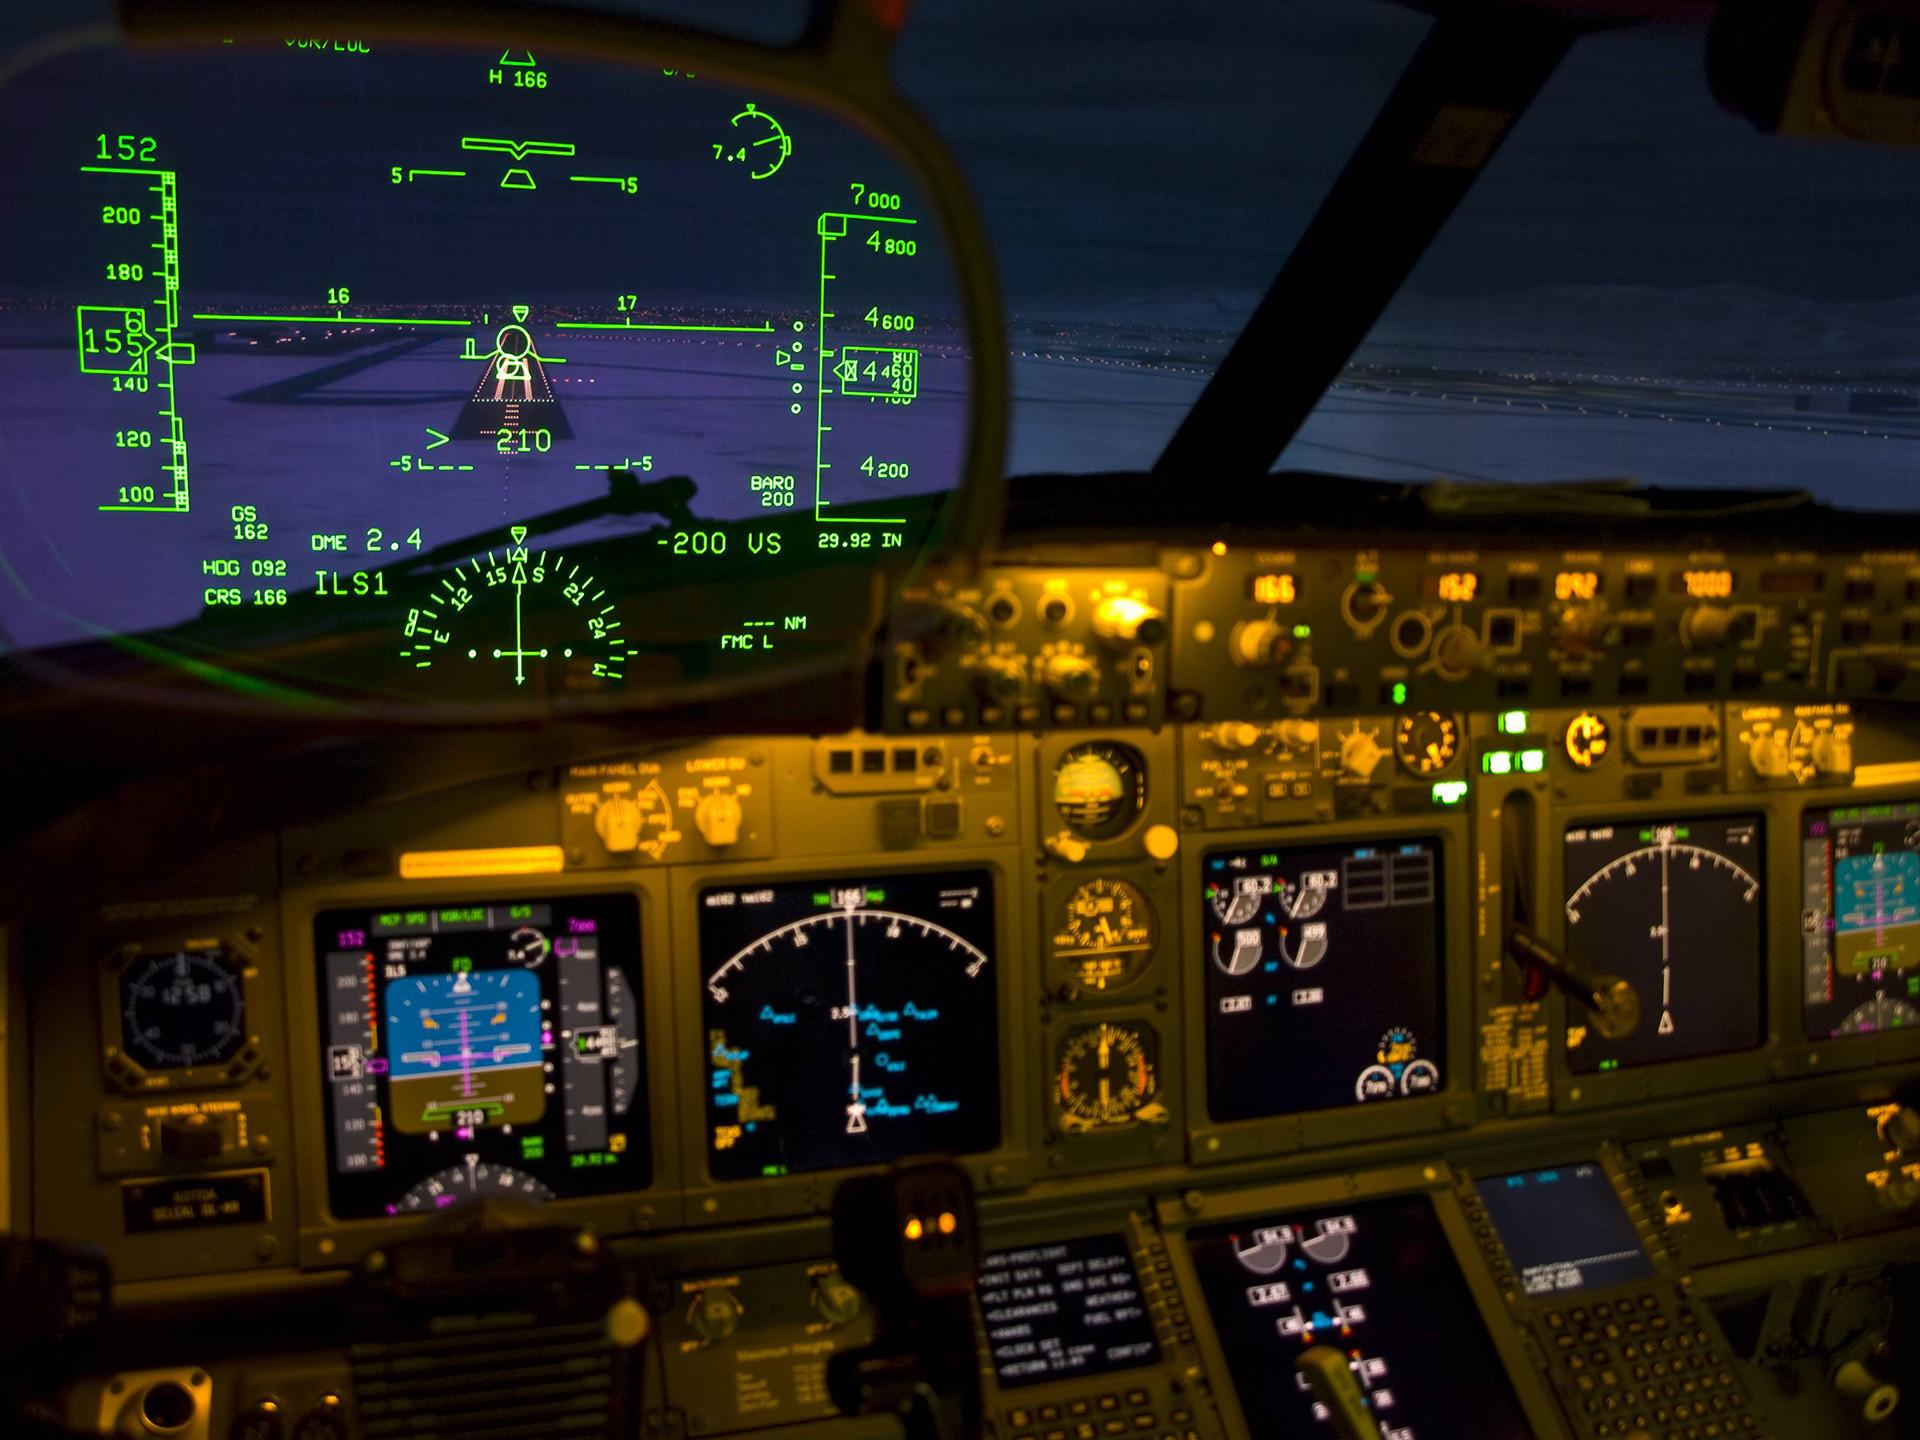 Aircraft Cockpit Cabin Inside Wallpaper 122959